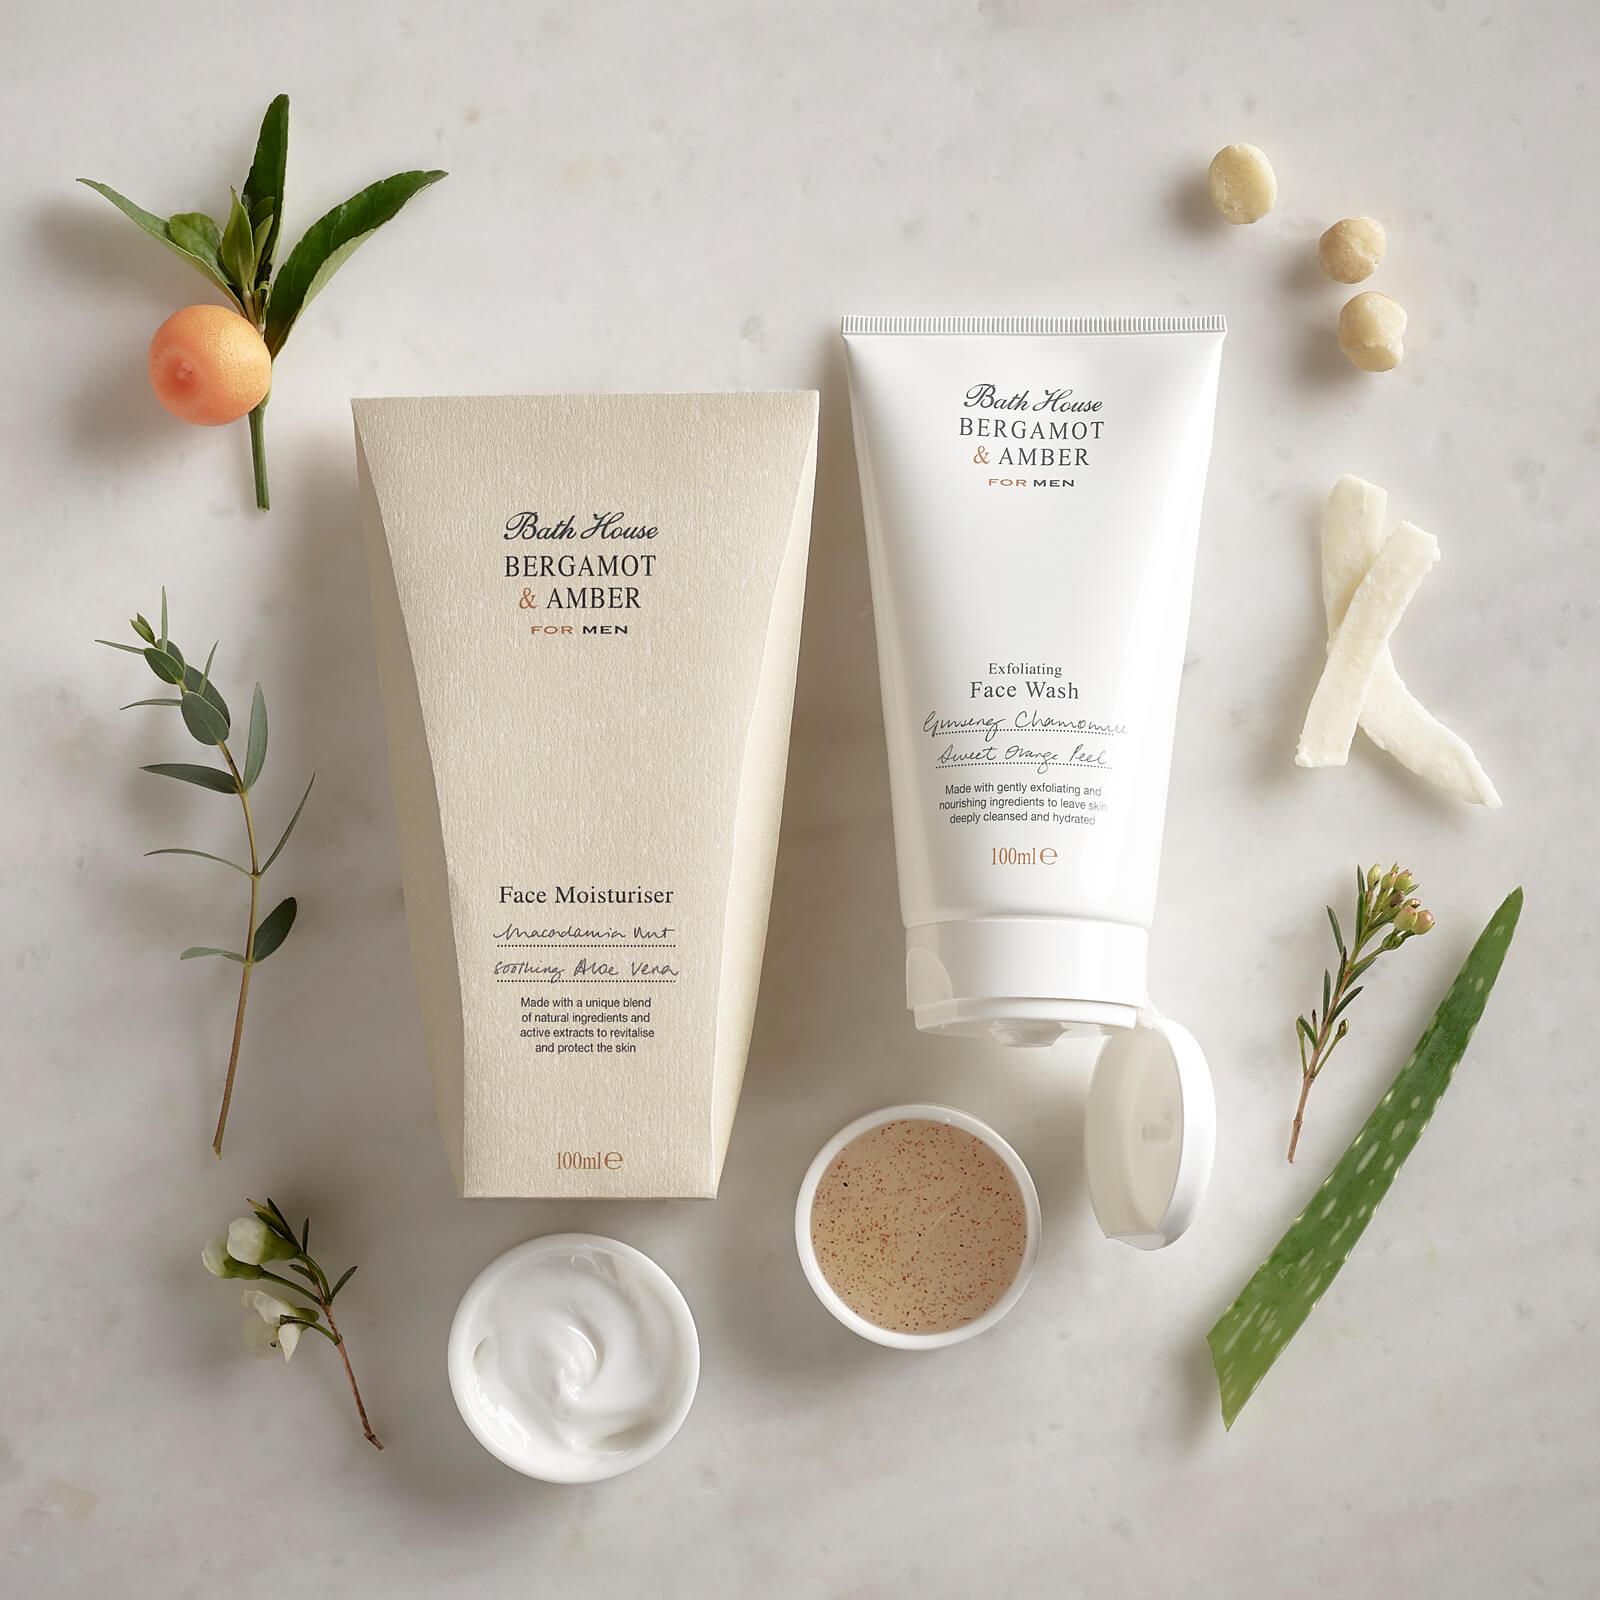 Bath House Bergamot & Amber Face Wash